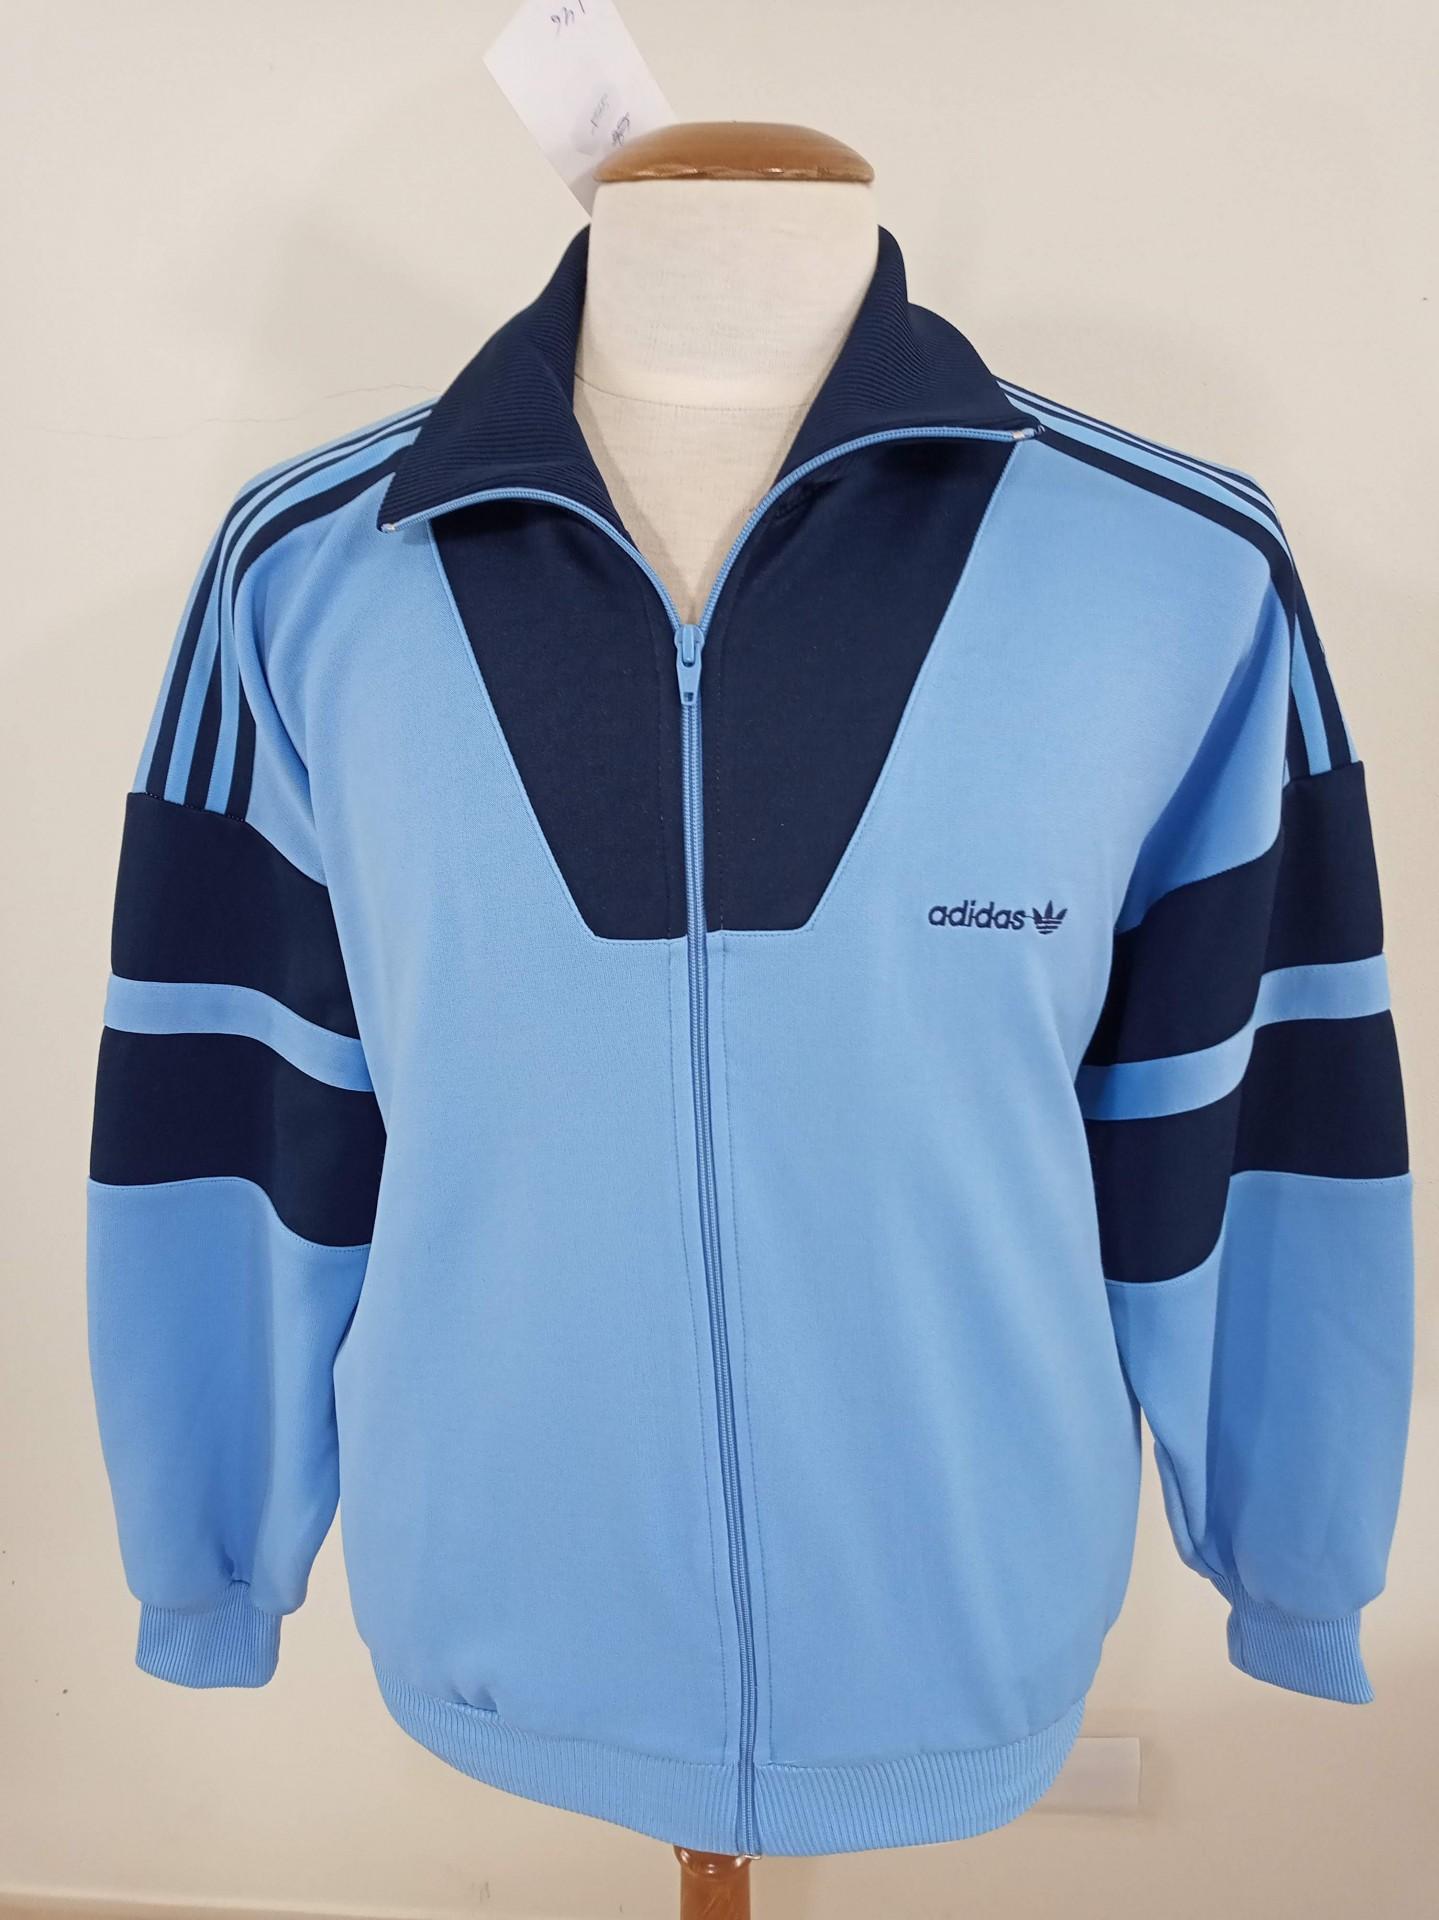 Vintage Track Top Adidas 1990s (M) Blue Jacket Antigo Casaco Azul | Vintage Sports Classic Football Shirts Jerseys Camisolas Futebol NBA